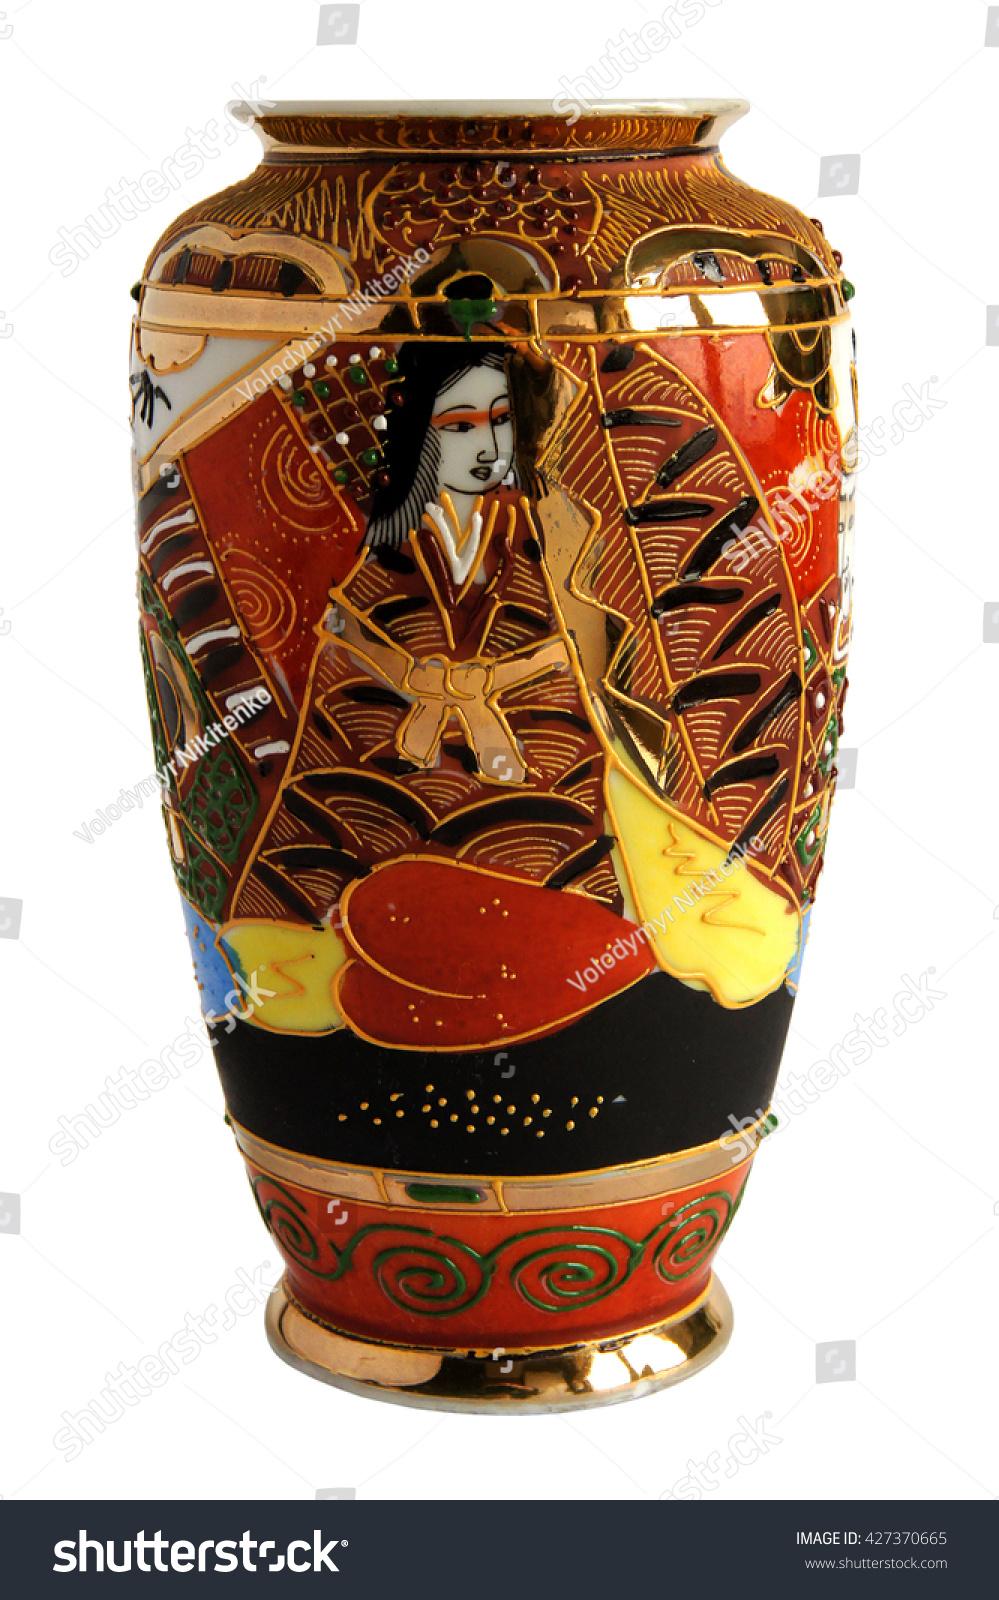 Antique japanese vase isolated on white stock photo 427370665 antique japanese vase isolated on white background reviewsmspy